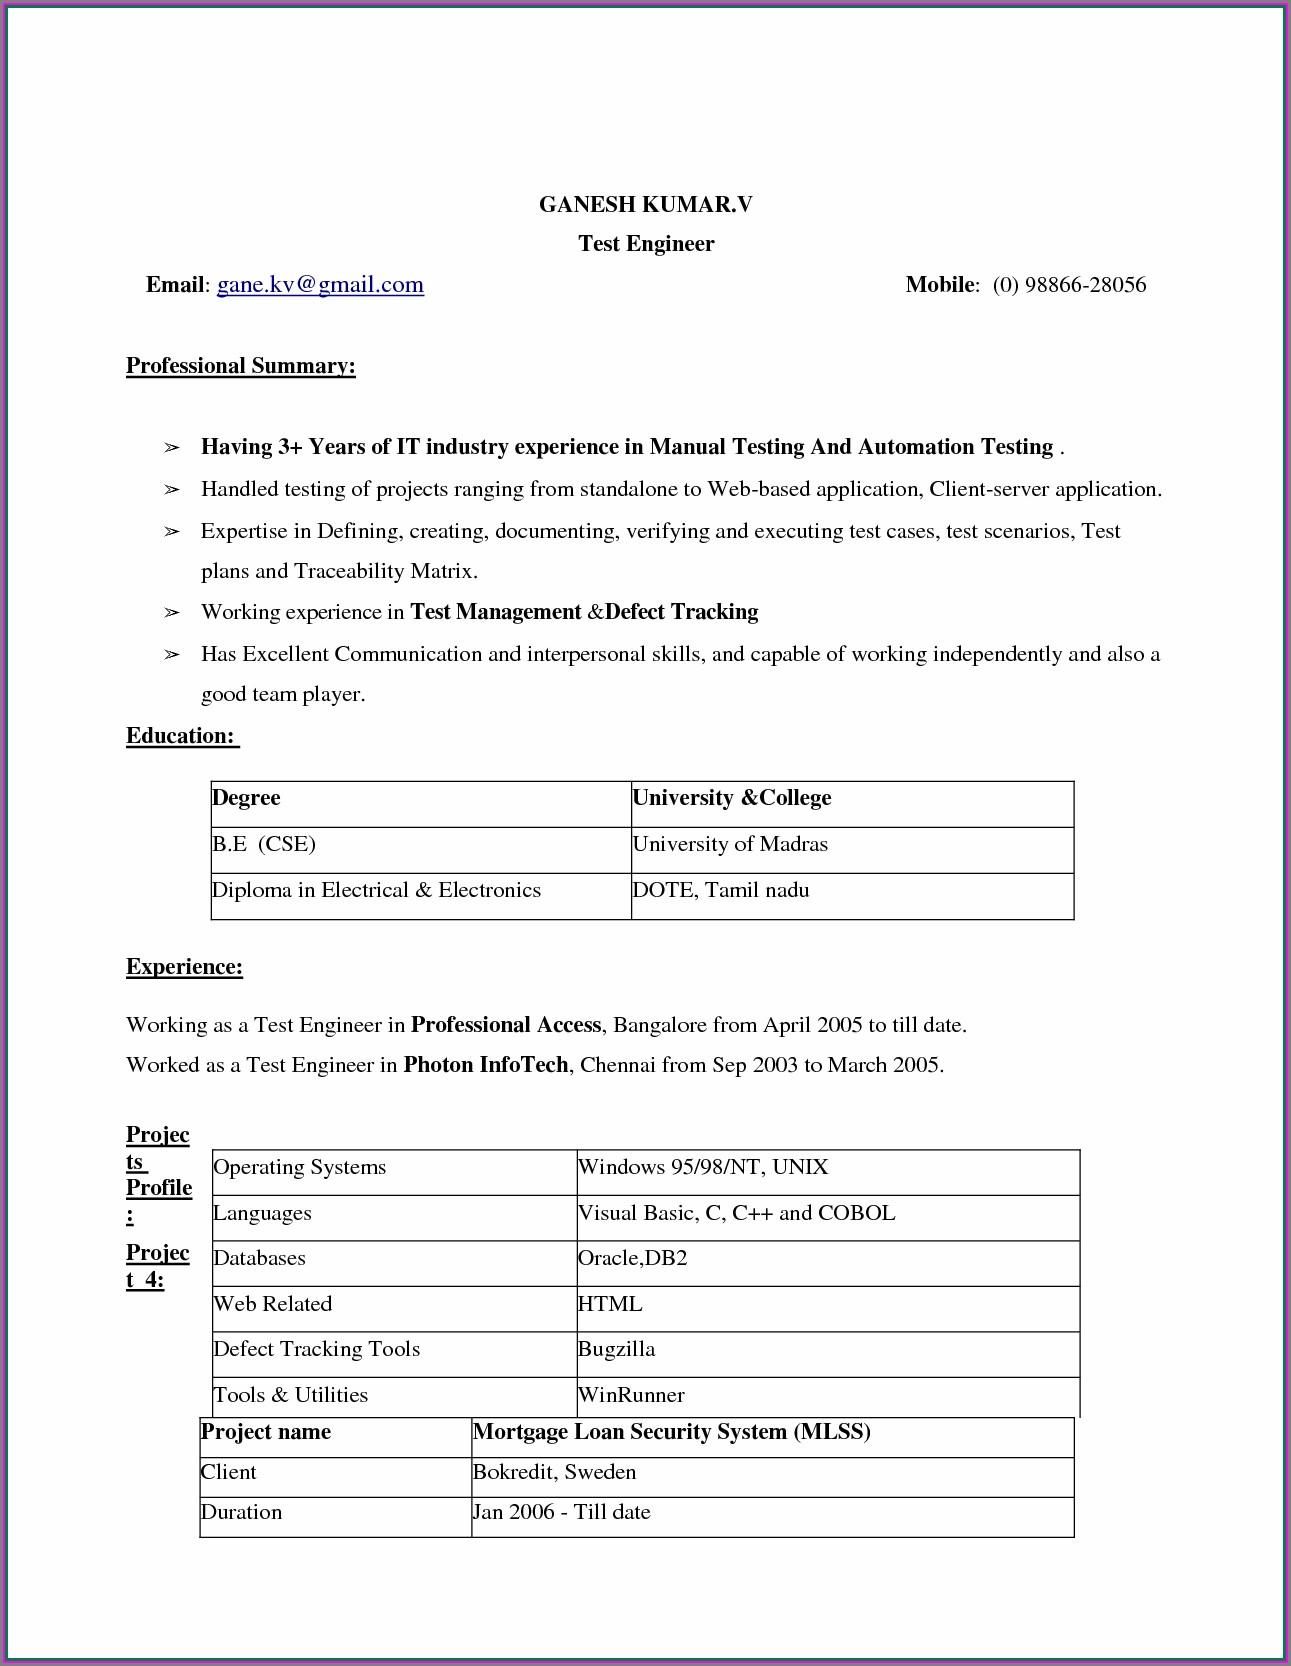 Resume Formatting On Word